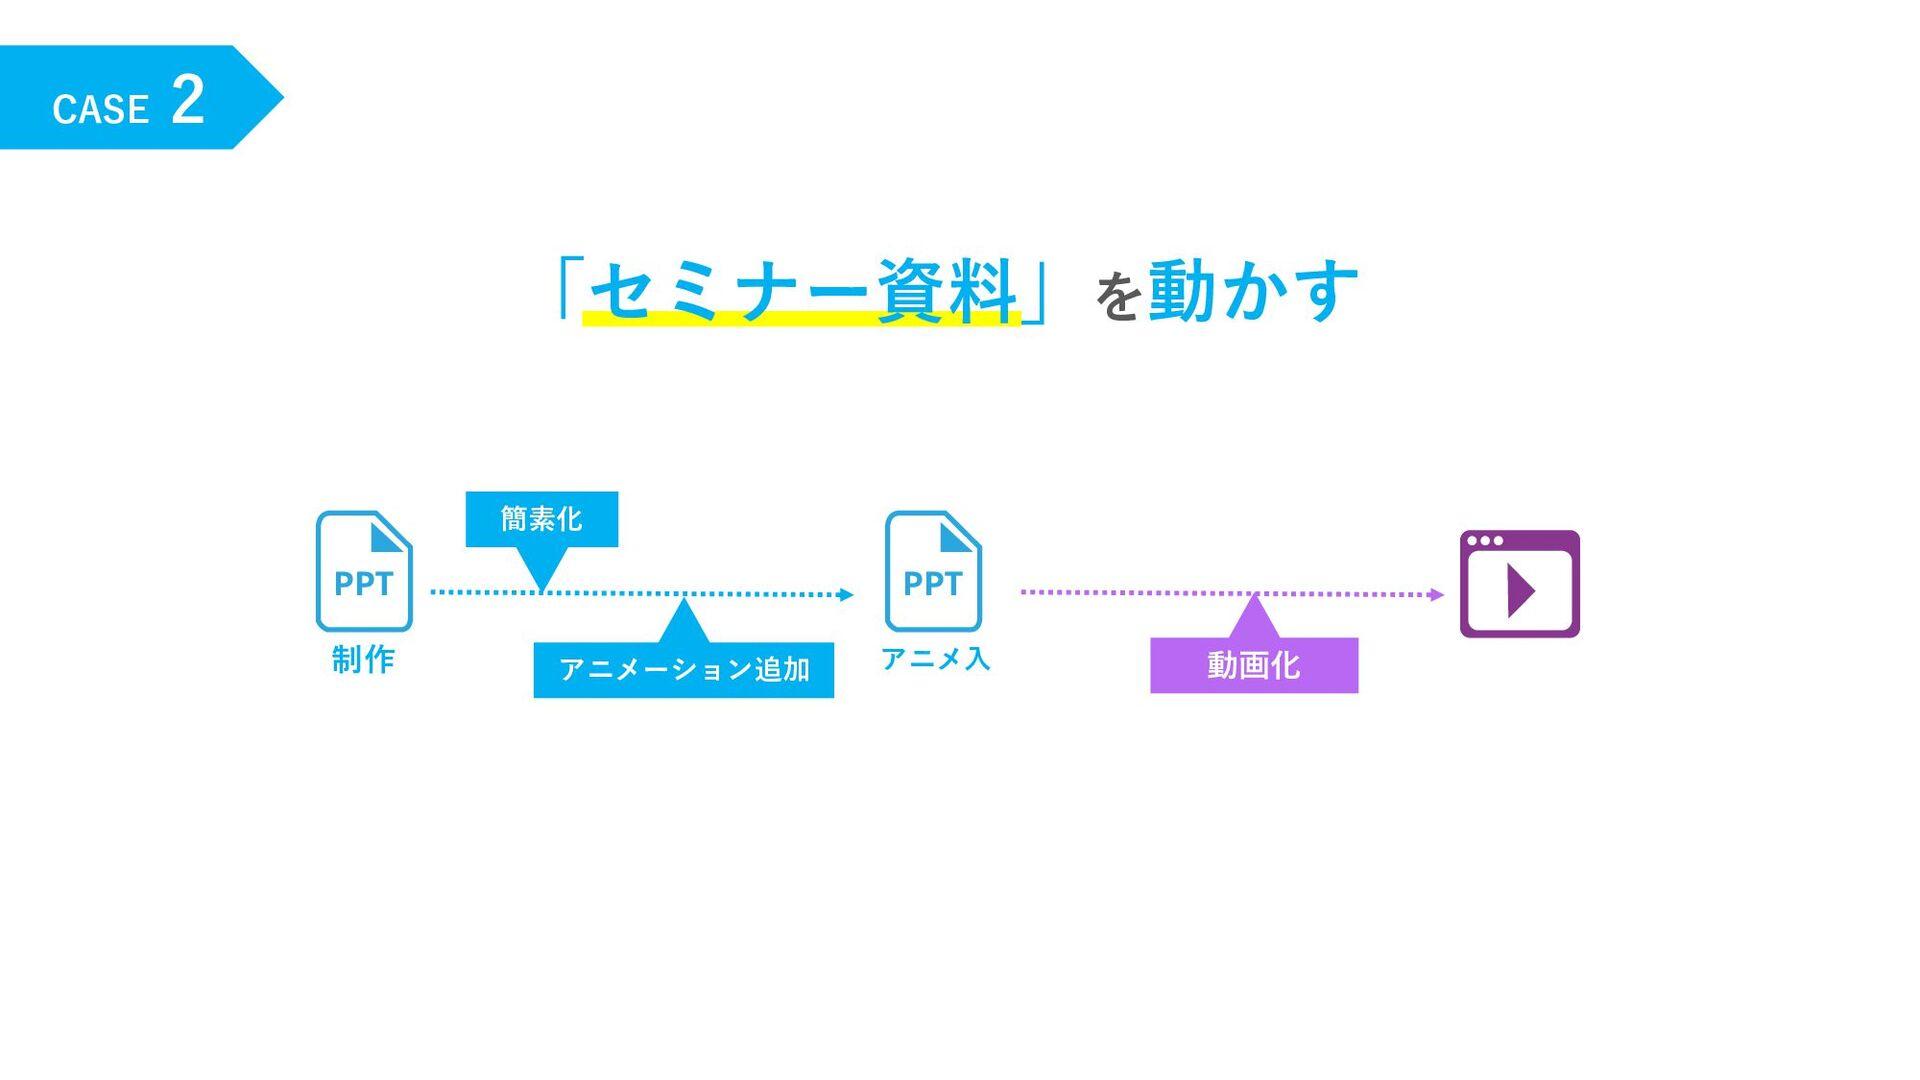 CASE 2 「セミナー資料」を動かす 制作 動画化 アニメーション追加 簡素化 アニメ⼊